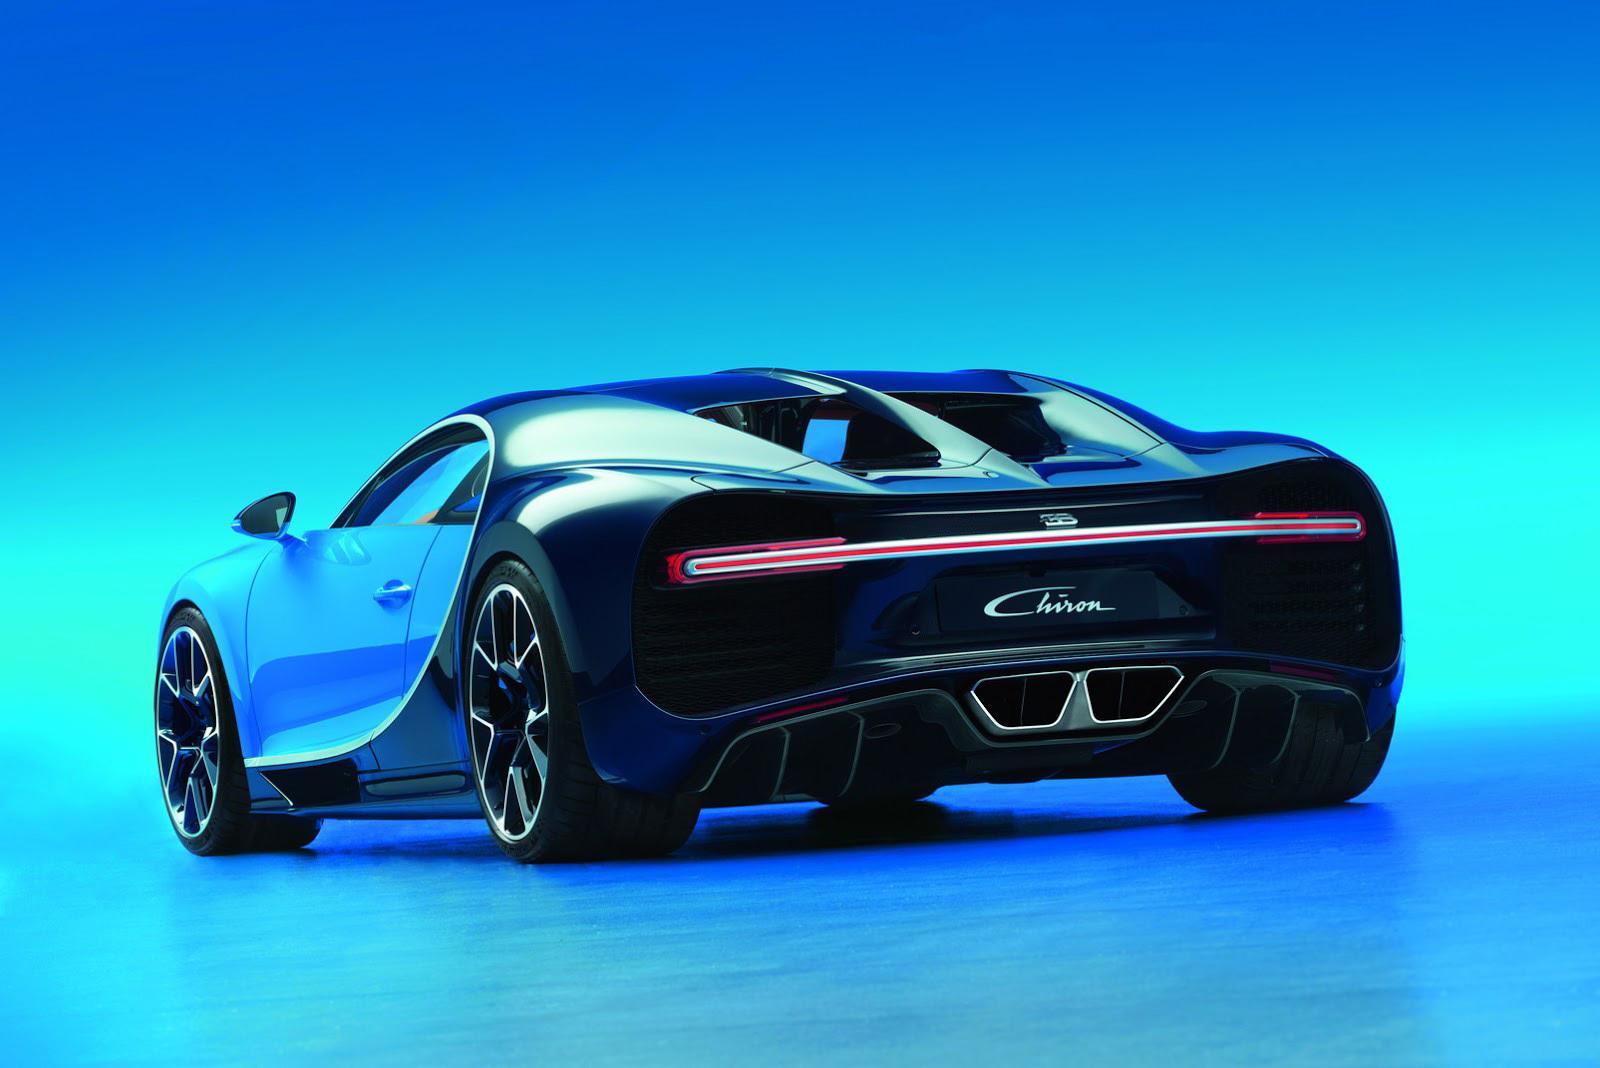 bugatti chiron - 1 500 cv  1 600 nm y 420 km  h - pasa y mira